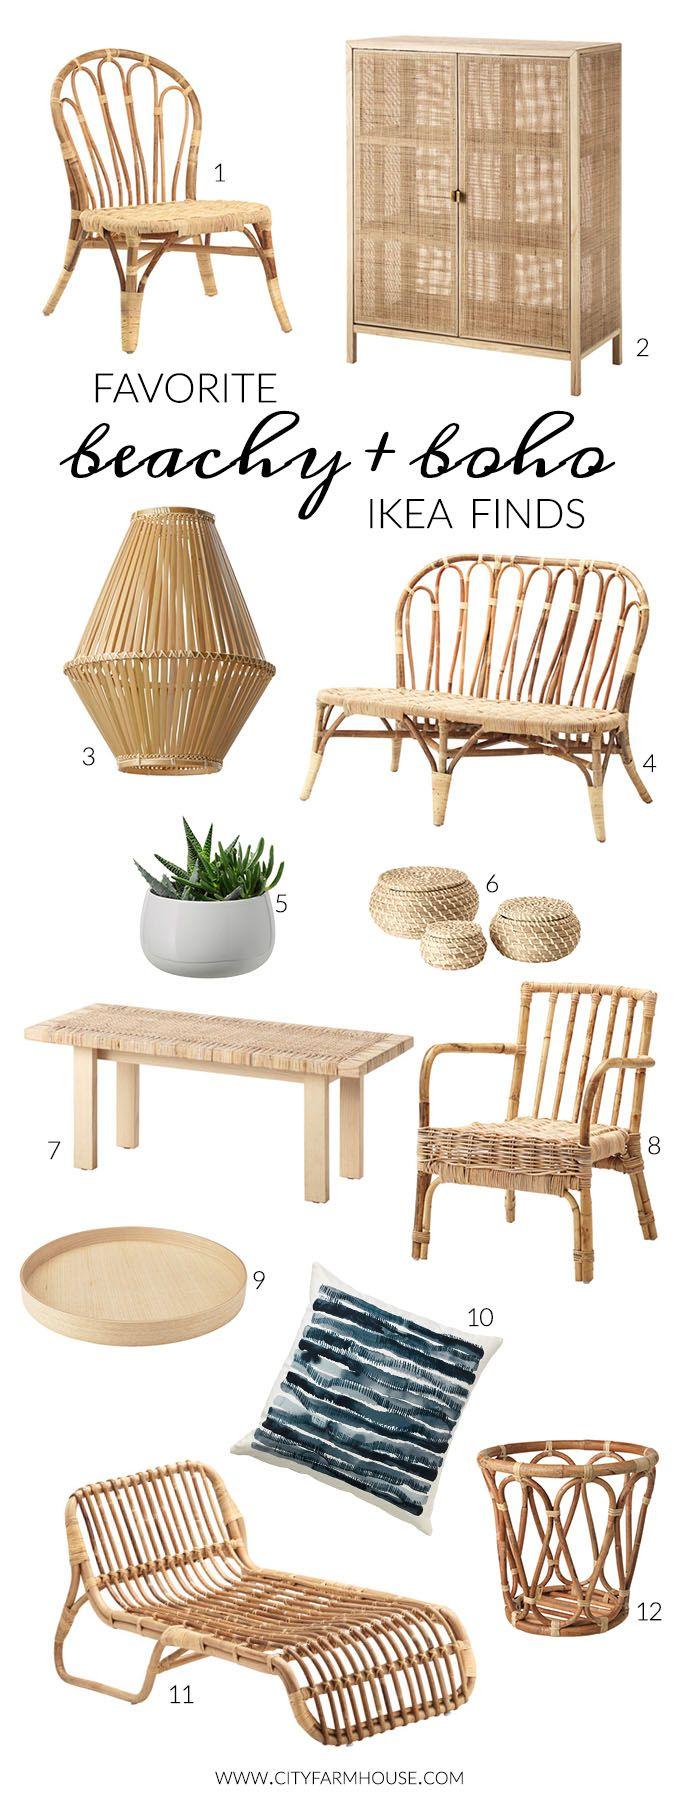 Favorite Beachy + Boho Ikea Finds | home | living room ...